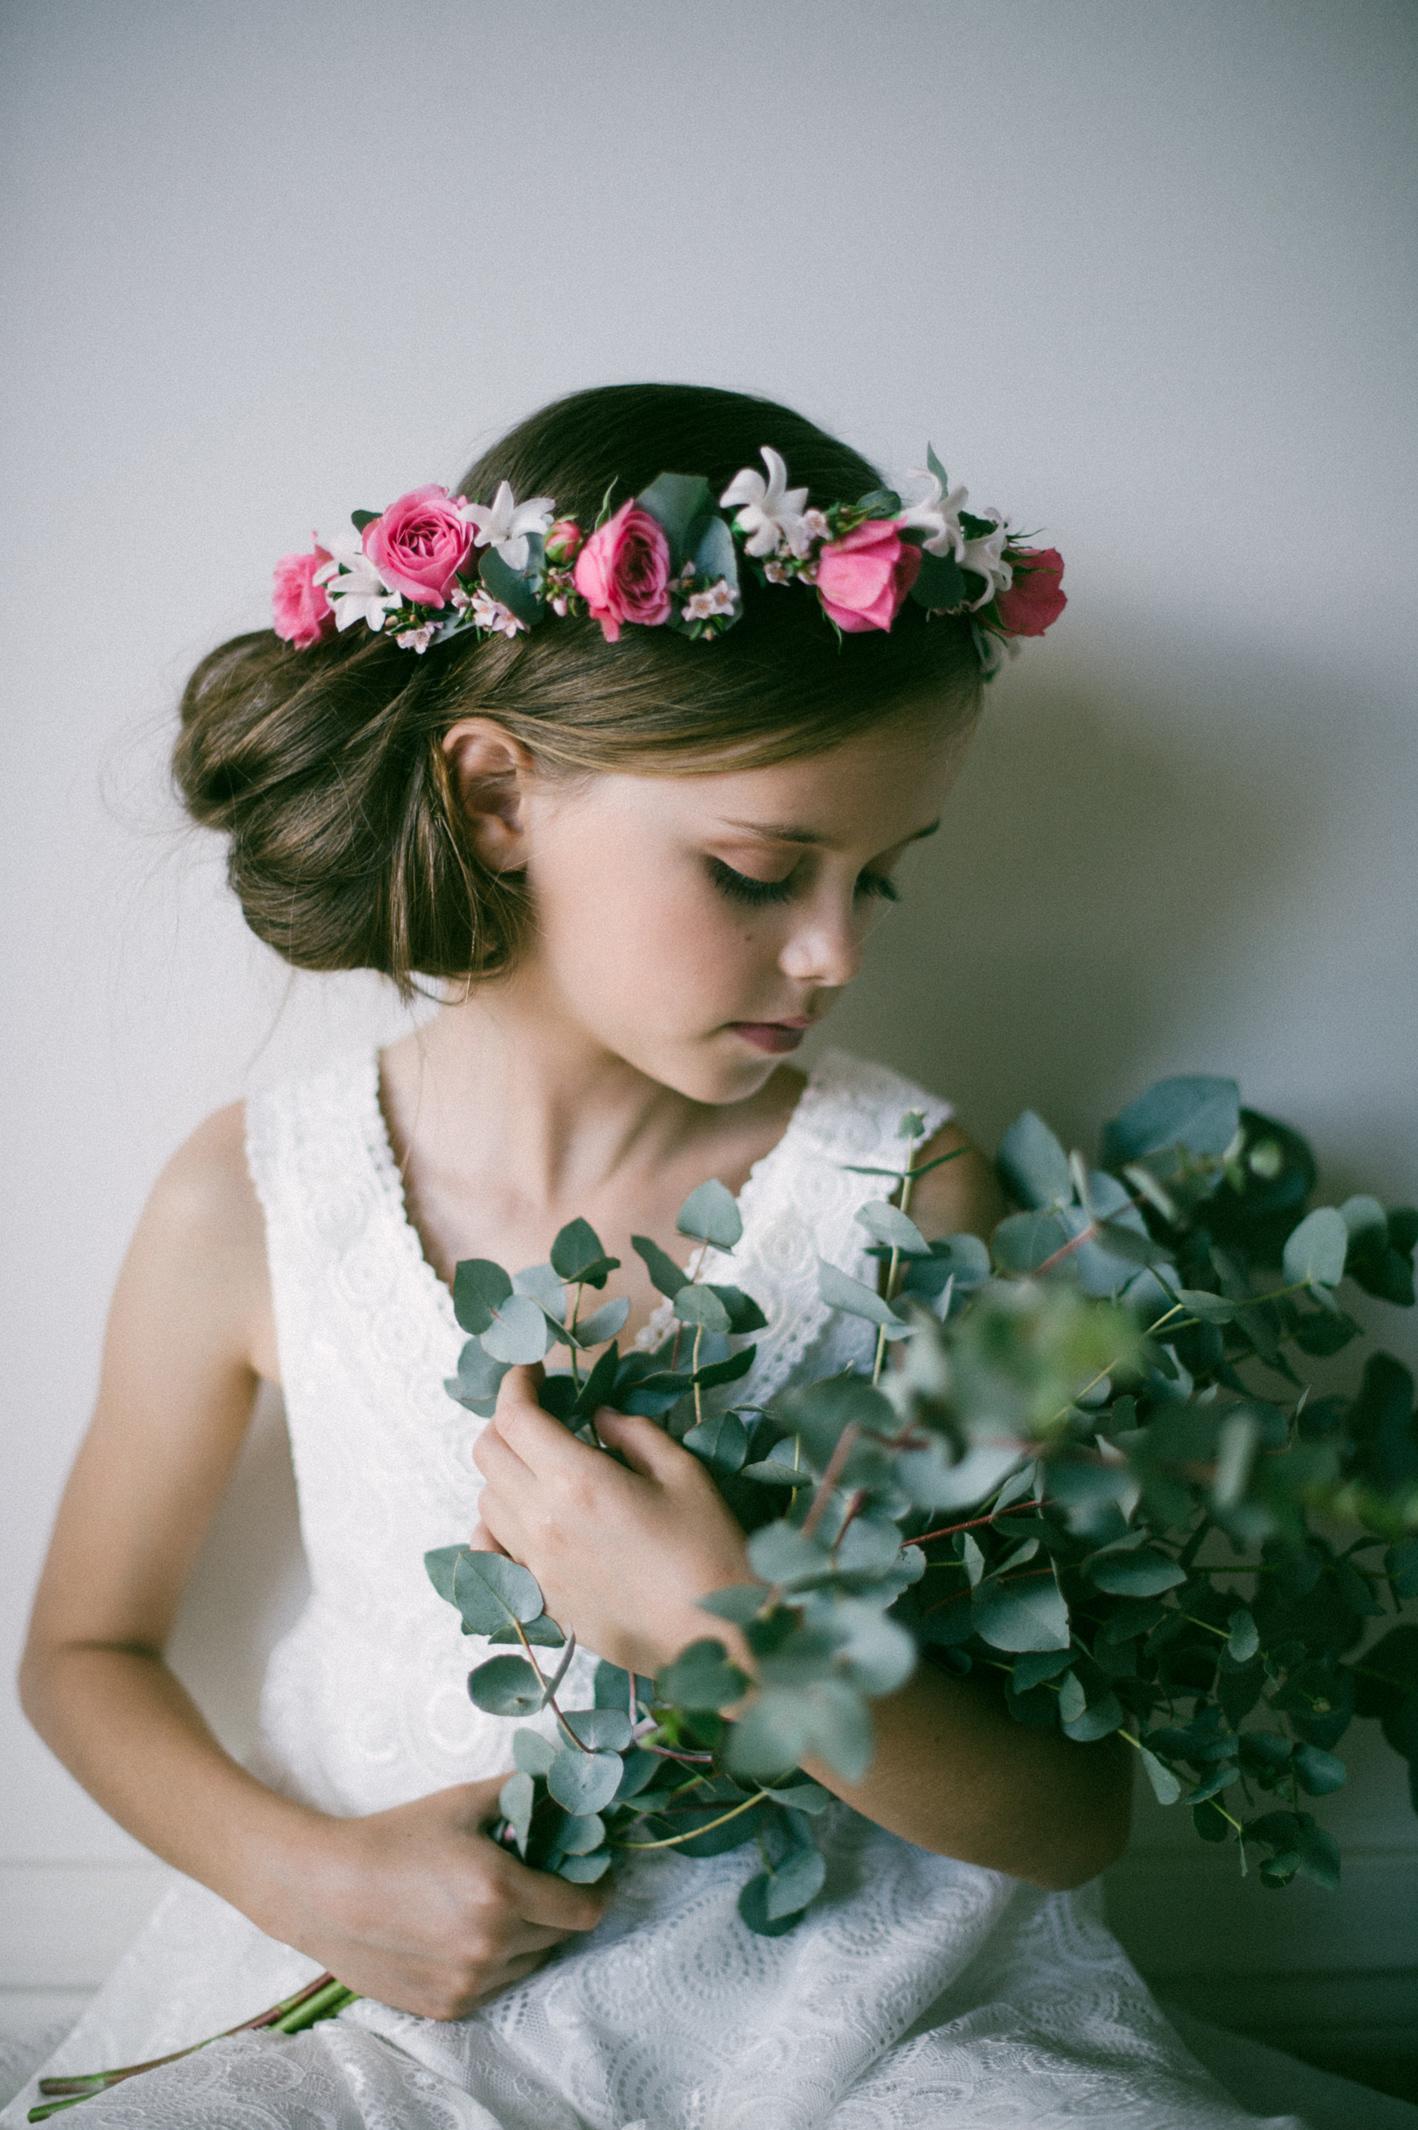 012-crown-of-eden-sophie-baker-photography